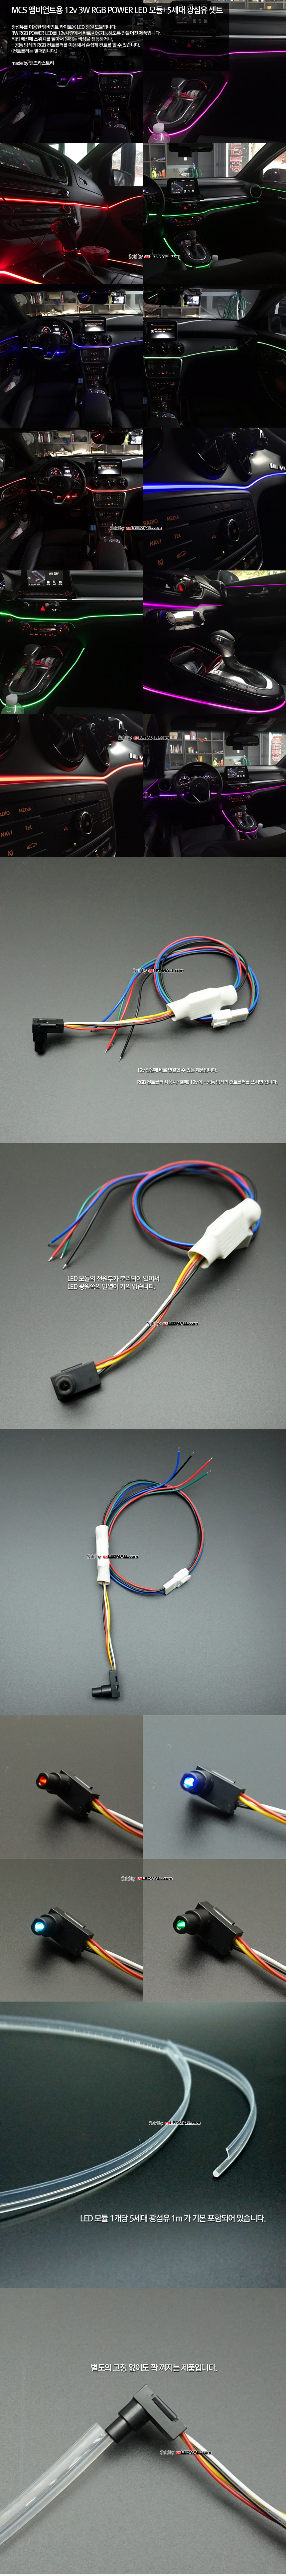 MCS 앰비언트 12v 3W RGB POWER LED 모듈+5세대 광섬유 셋트